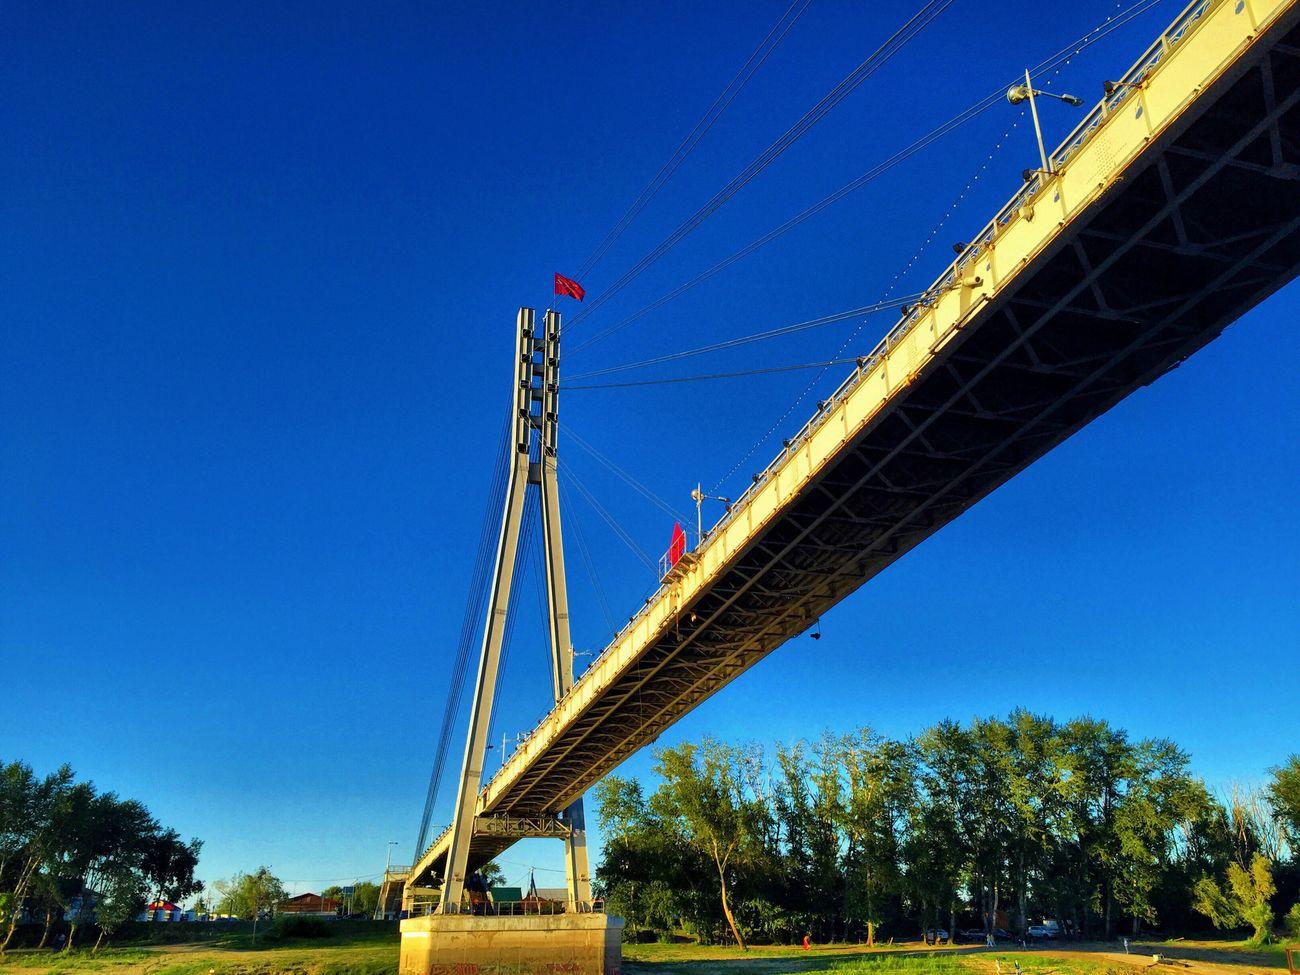 Тюмень моствлюбленных лето 2016 отпуск 2016 красота жара солнце прогулка набережная река тура фото Tyumen Bridge BridgeLovers Thesun Heat Tour River Photo